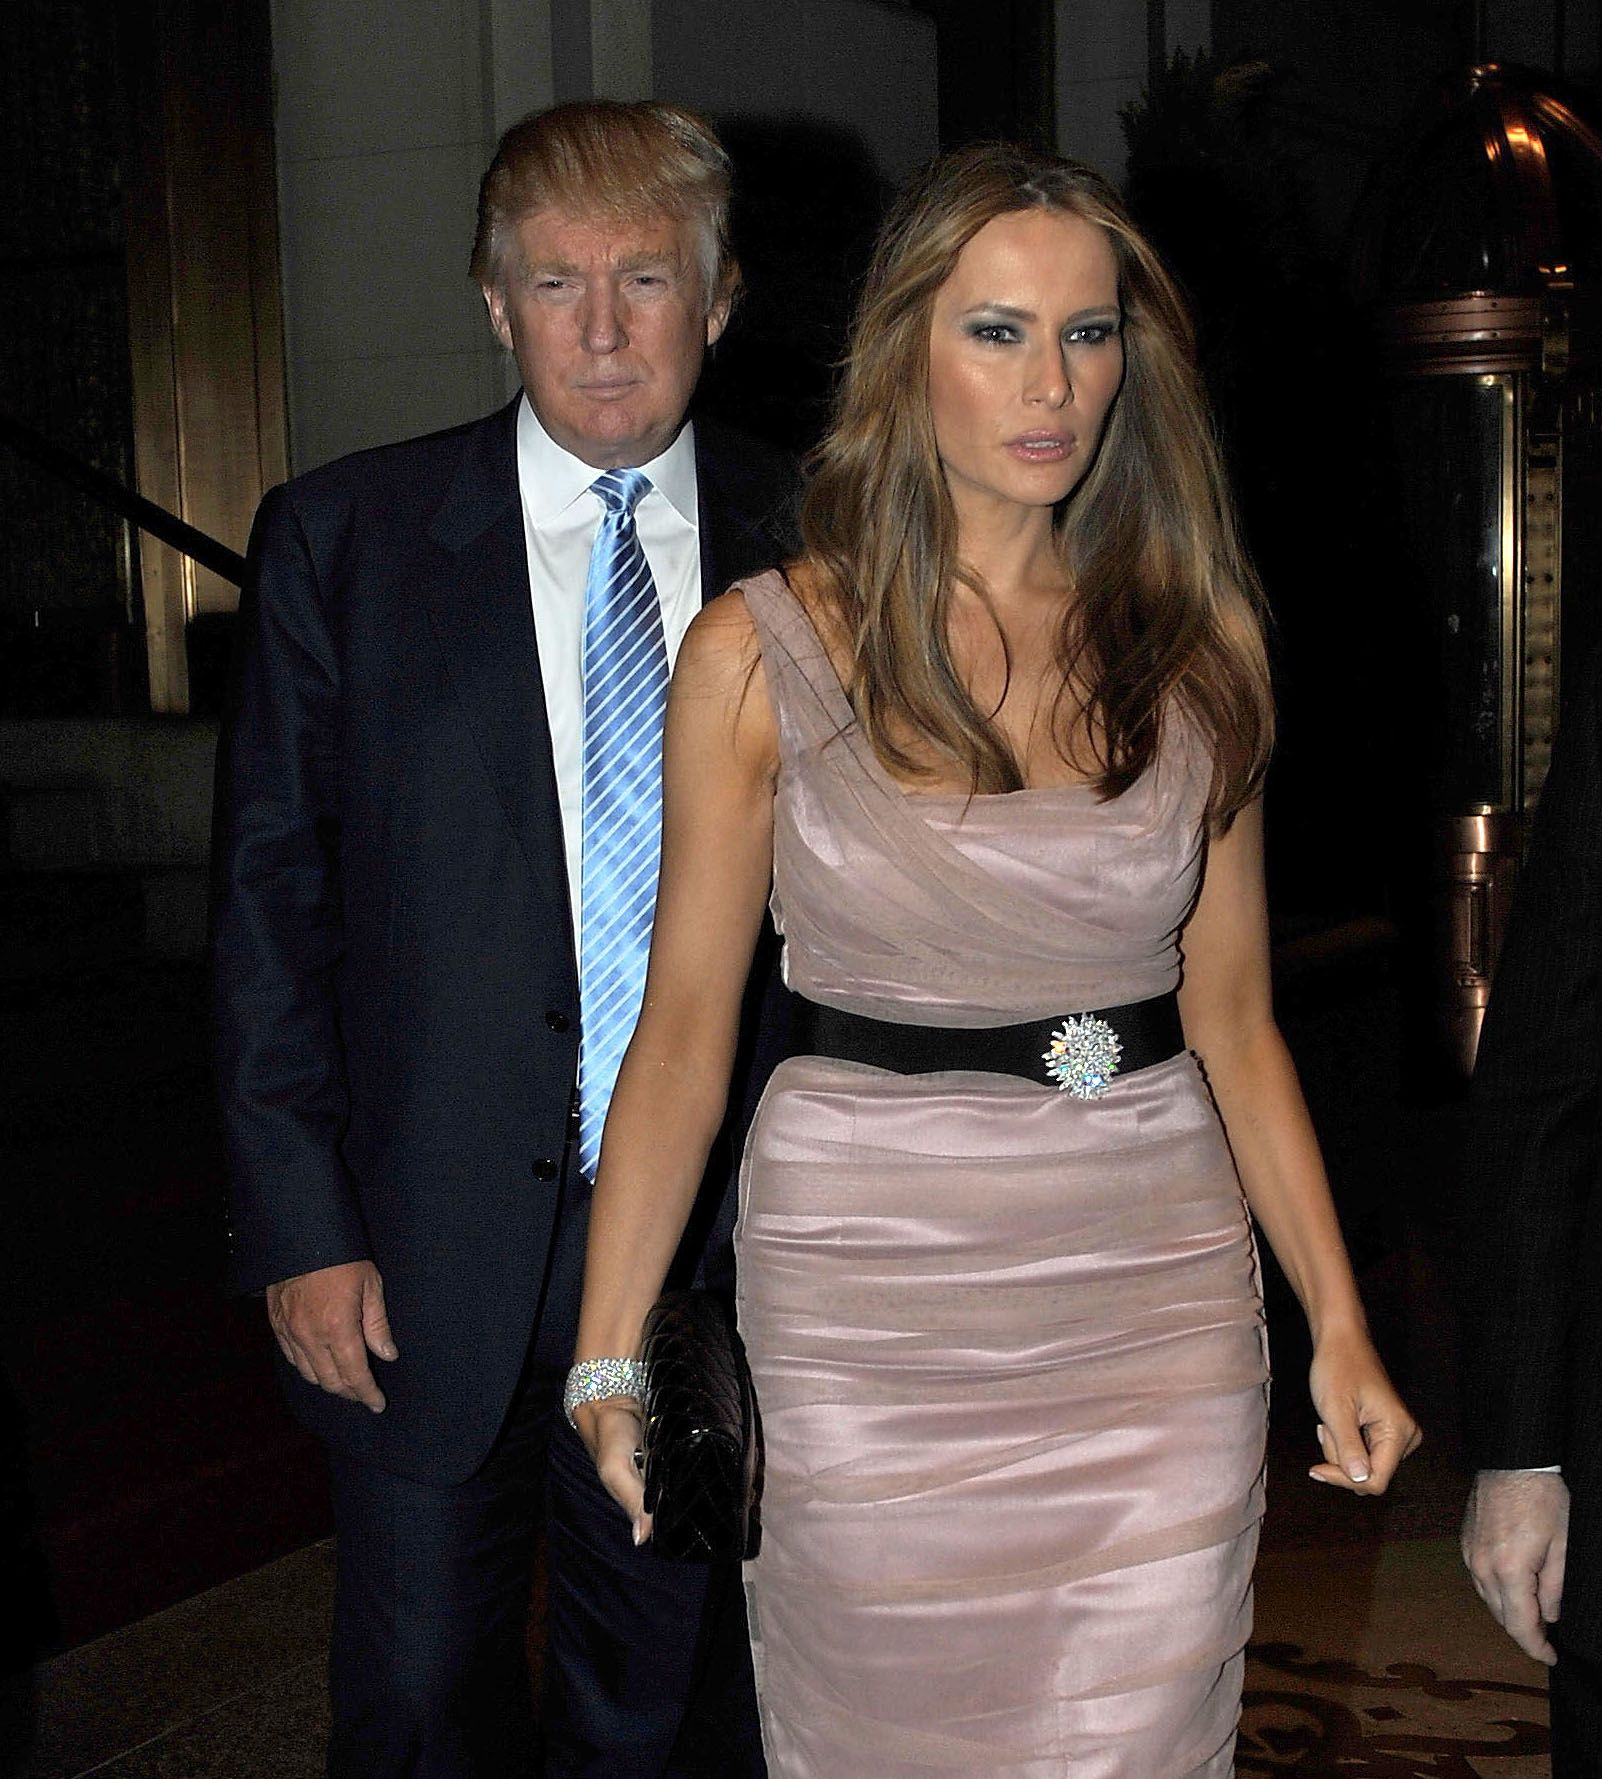 Donald Trump And Melania Wedding: Image Result For Donald Trump Daughter Wedding